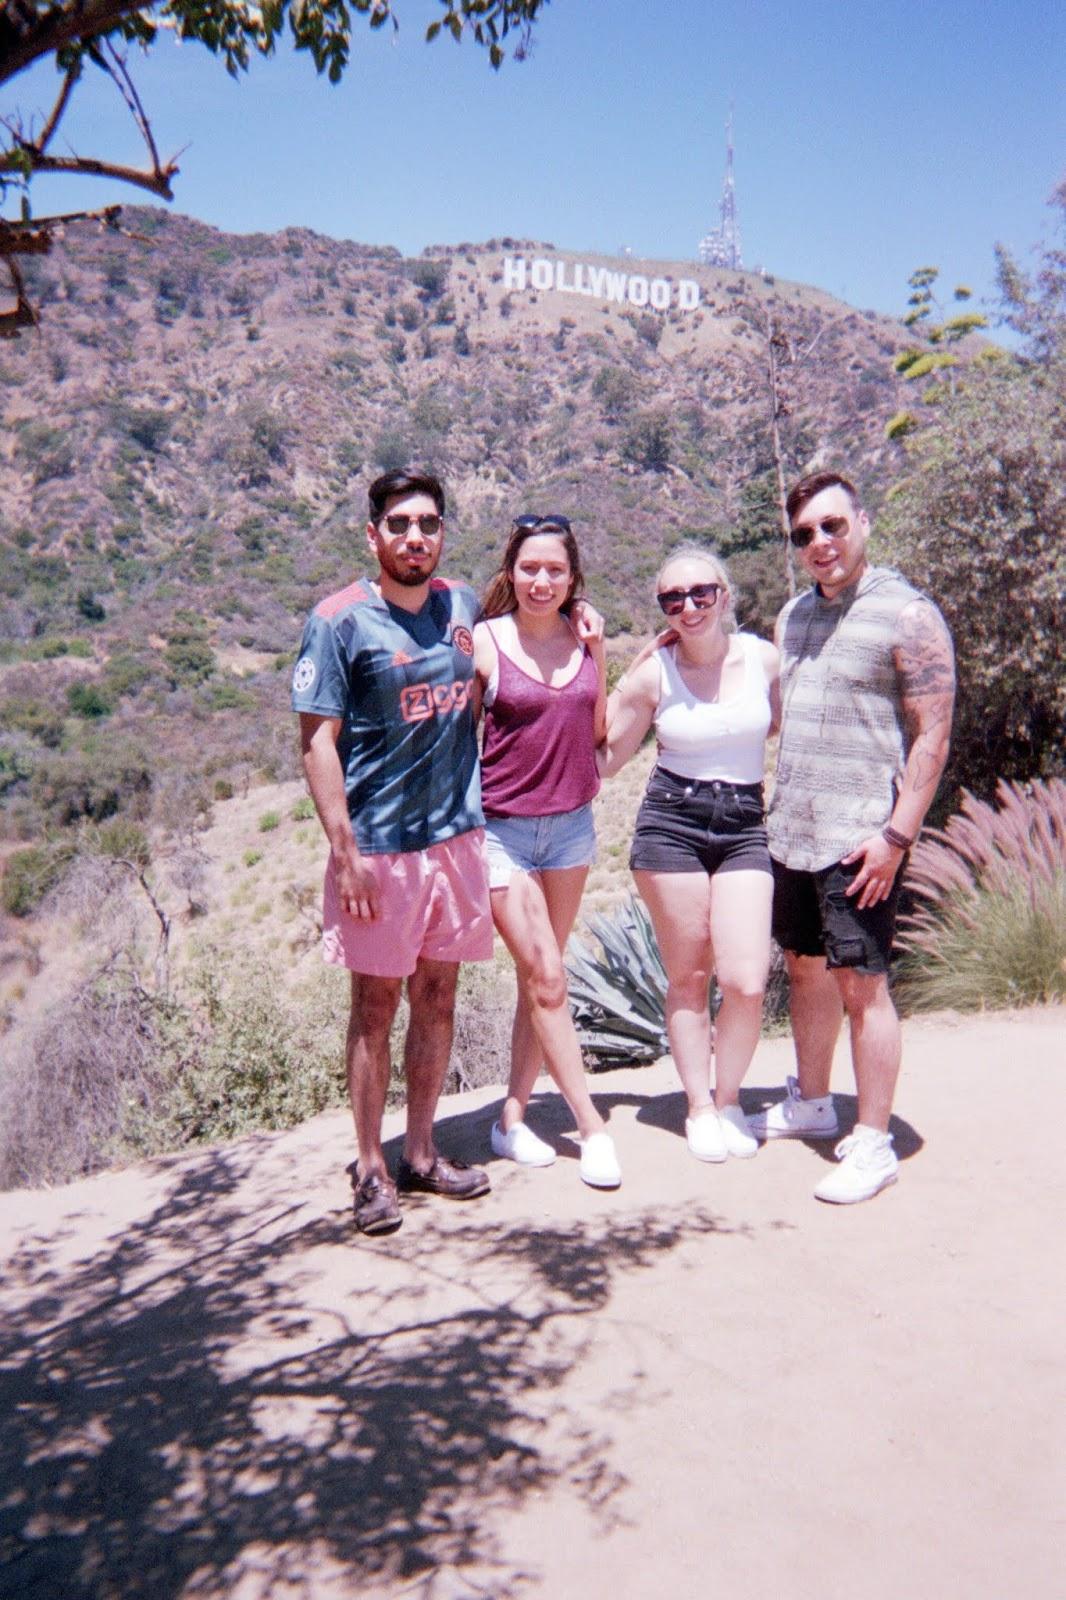 L.A. On Film